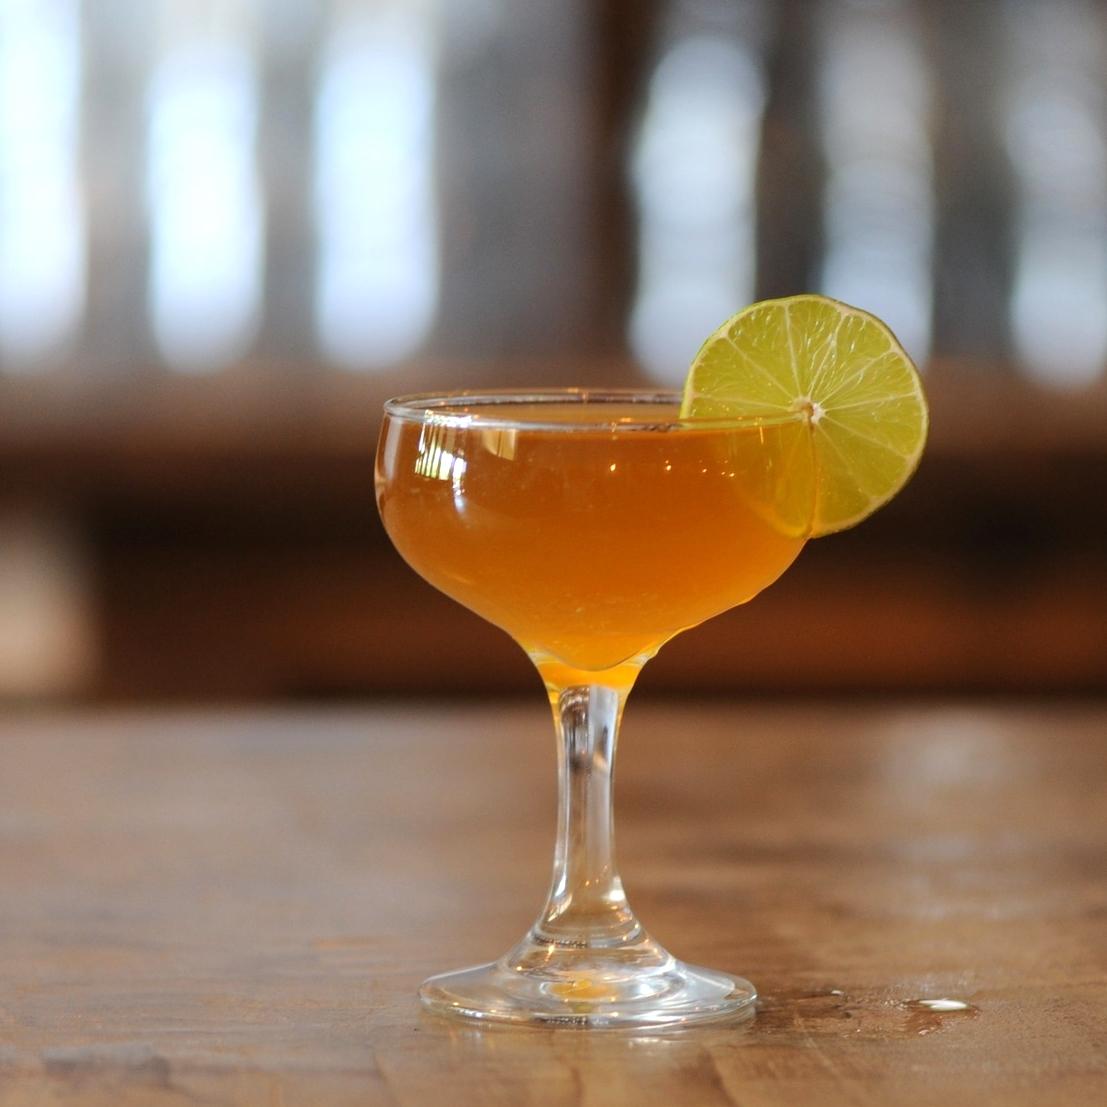 the-cocktail-experiment-syrups-madagascar-vanilla-daiquiri.jpg